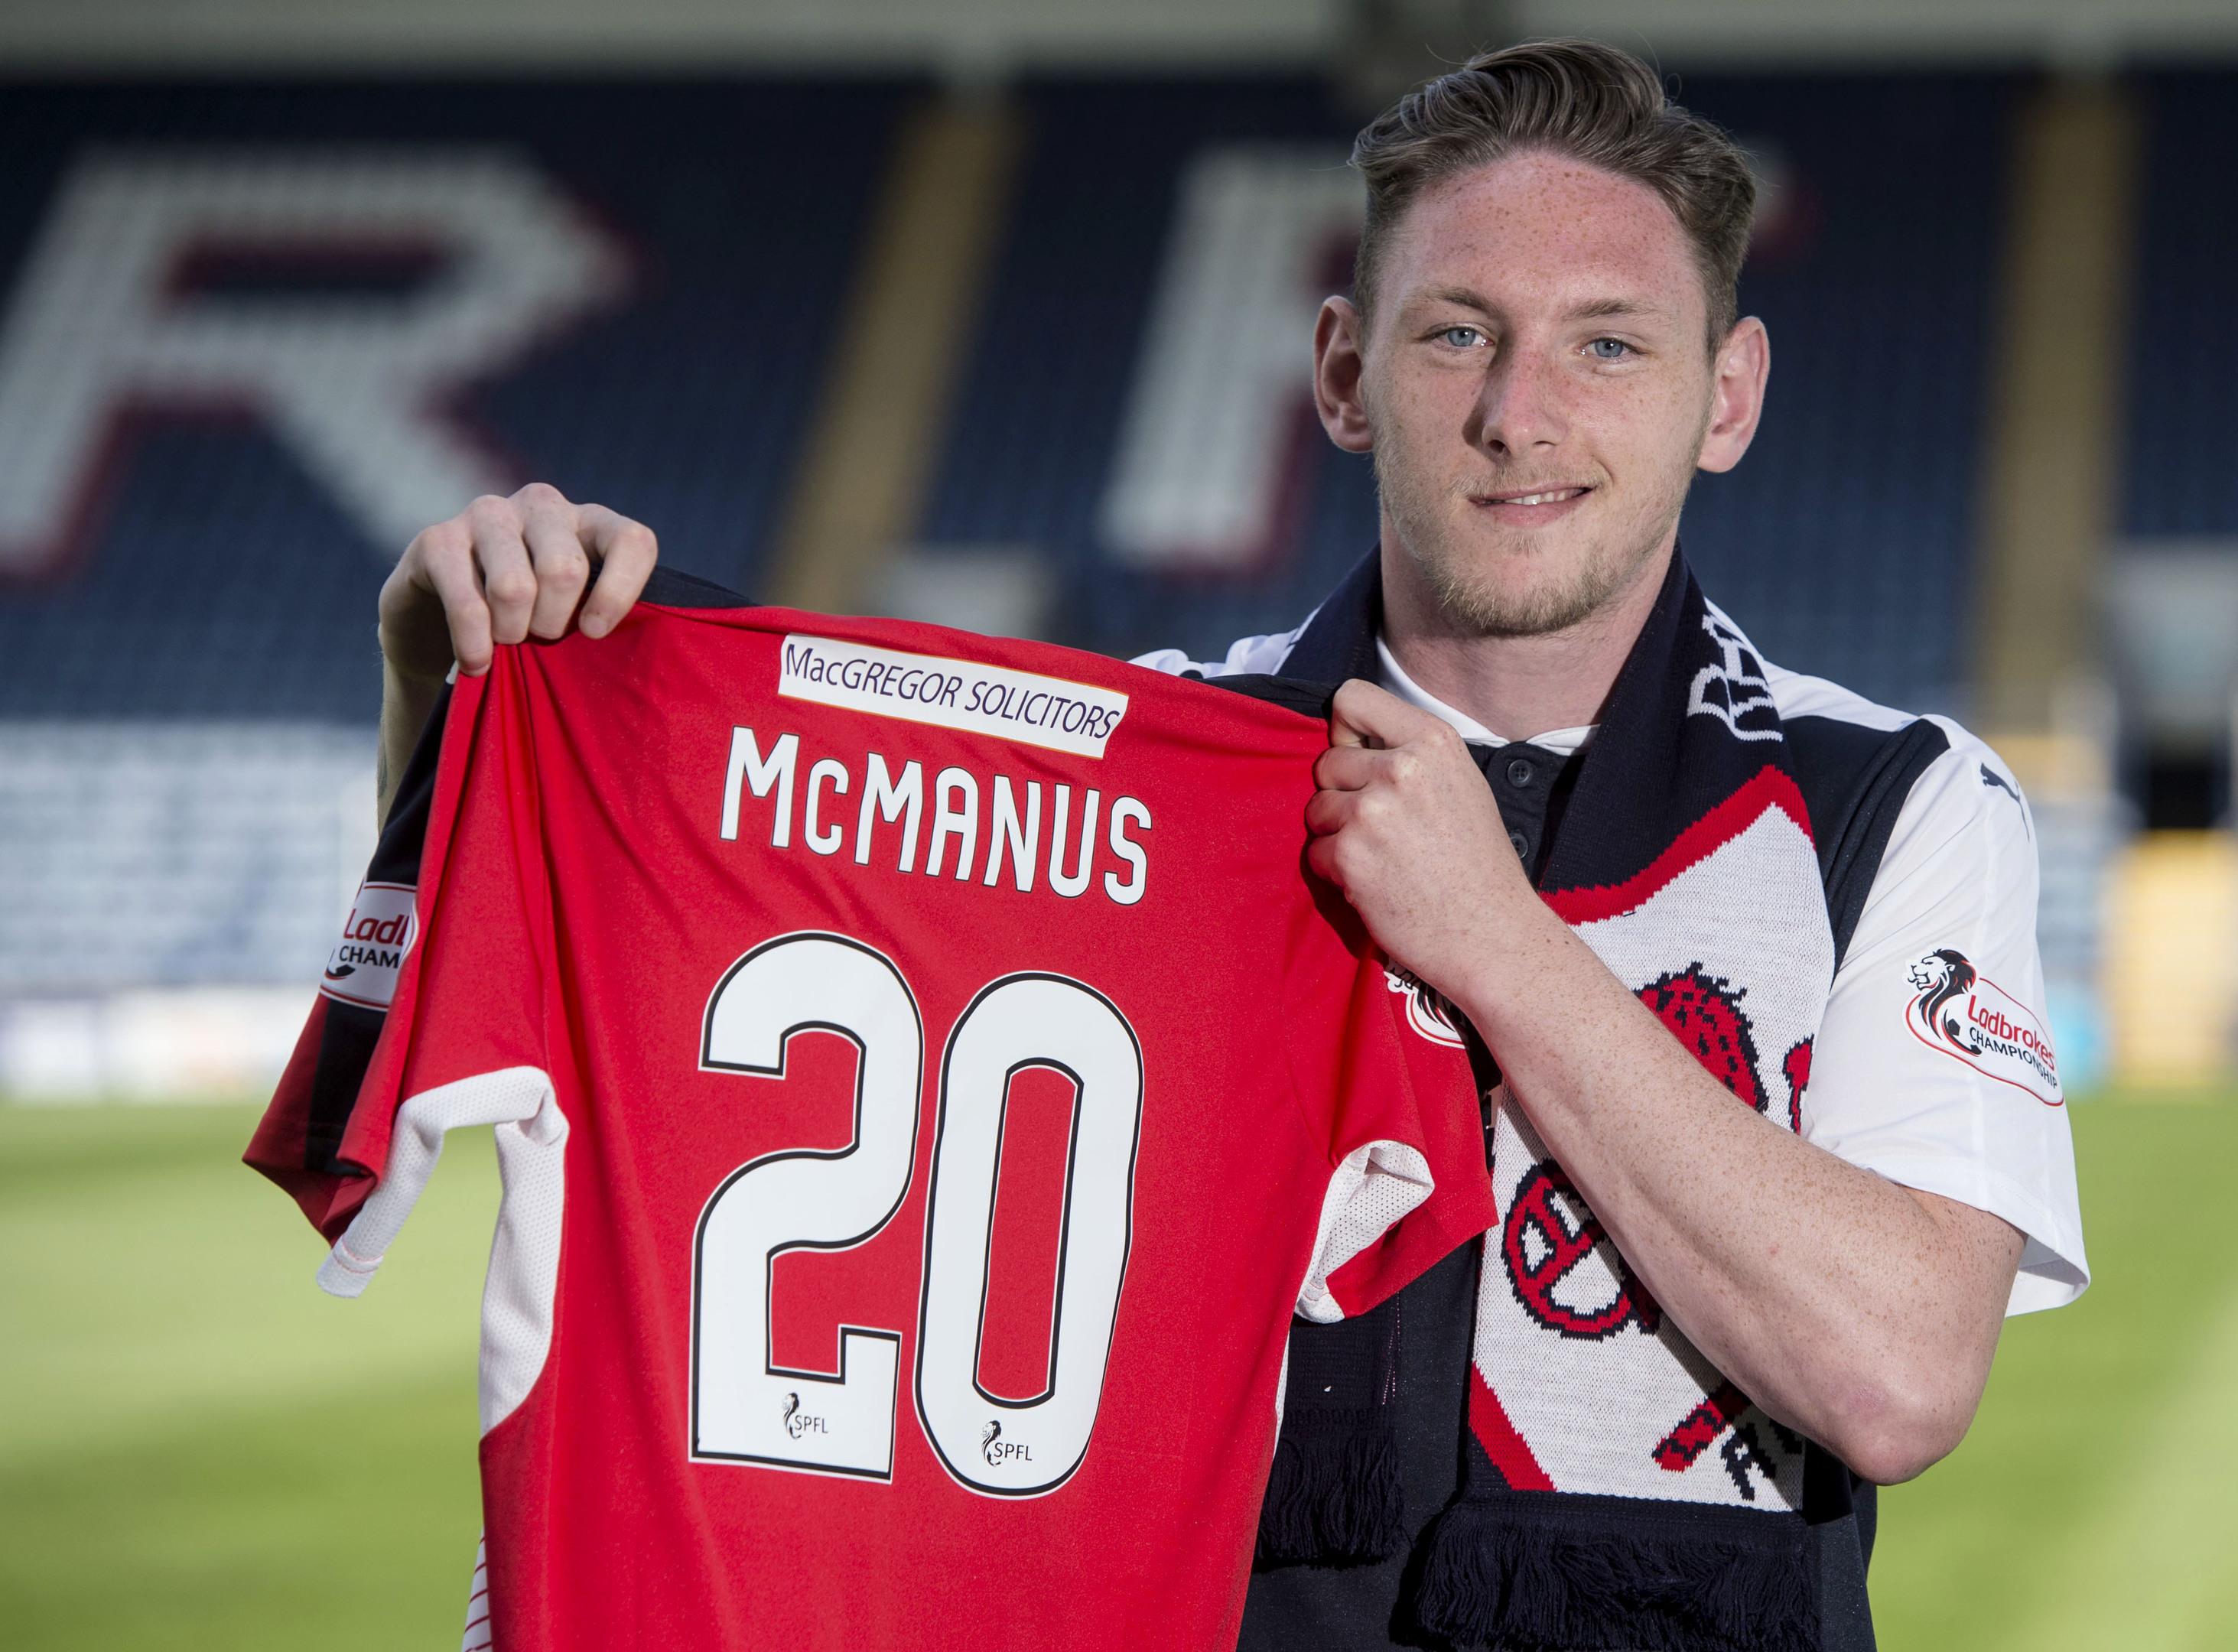 Declan McManus.